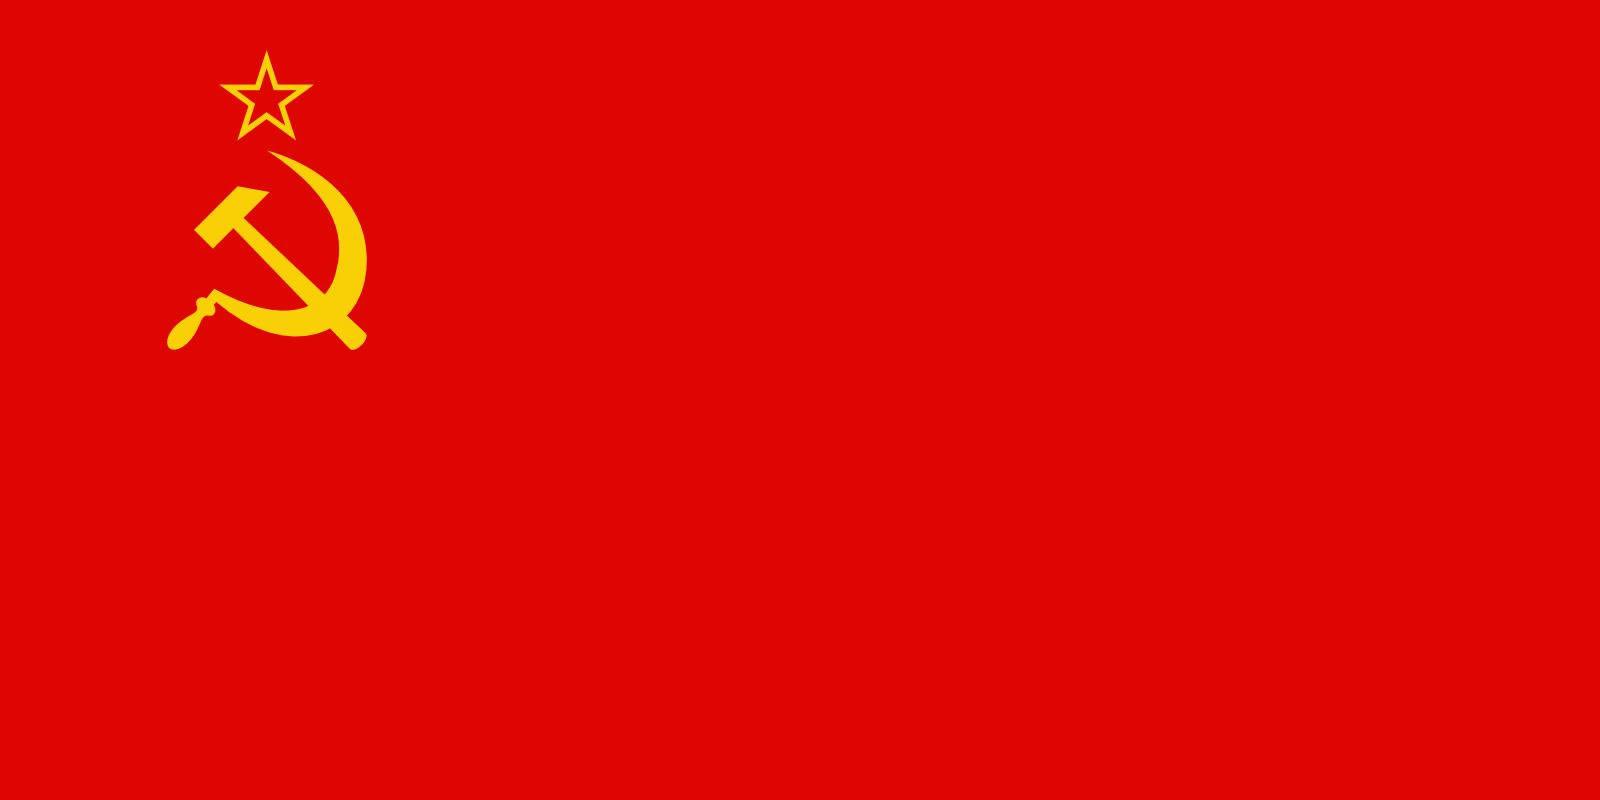 Soviet clip art /flagofthesovietunion